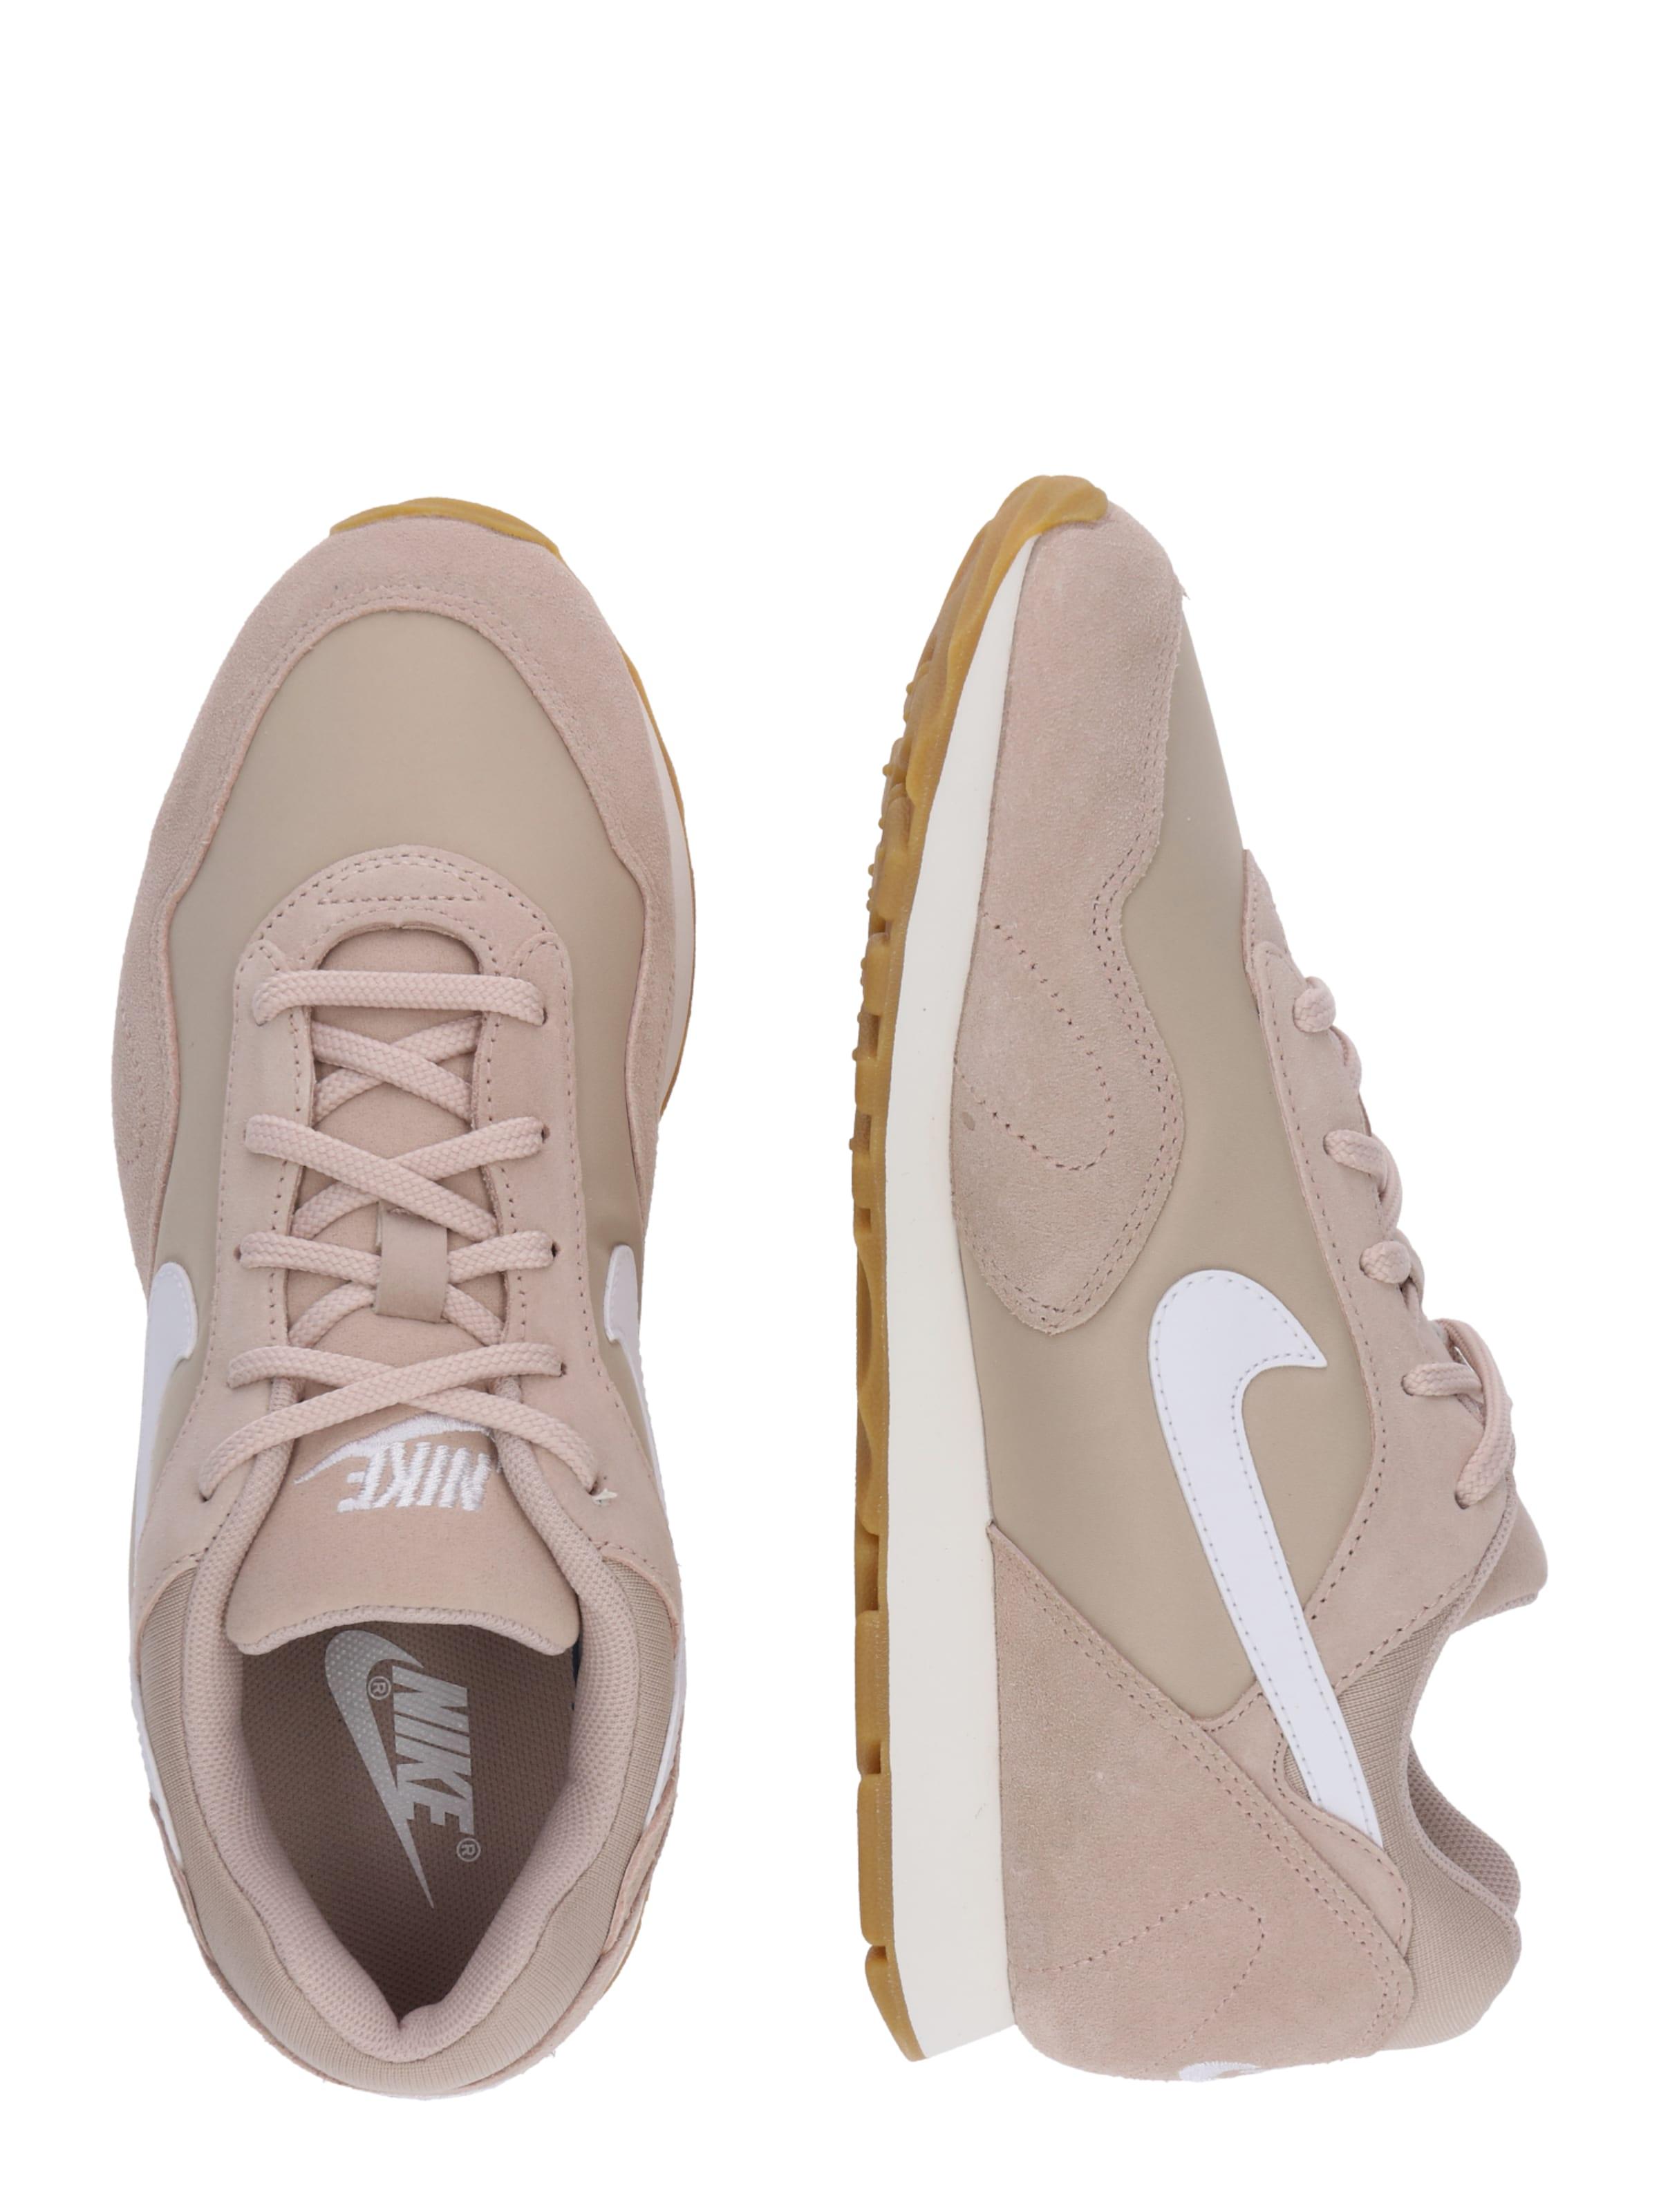 Nike Sportswear Turnschuhe Low 'Outburst Leder, Leder, Leder, Textil Verkaufen Sie saisonale Aktionen 5fbb24